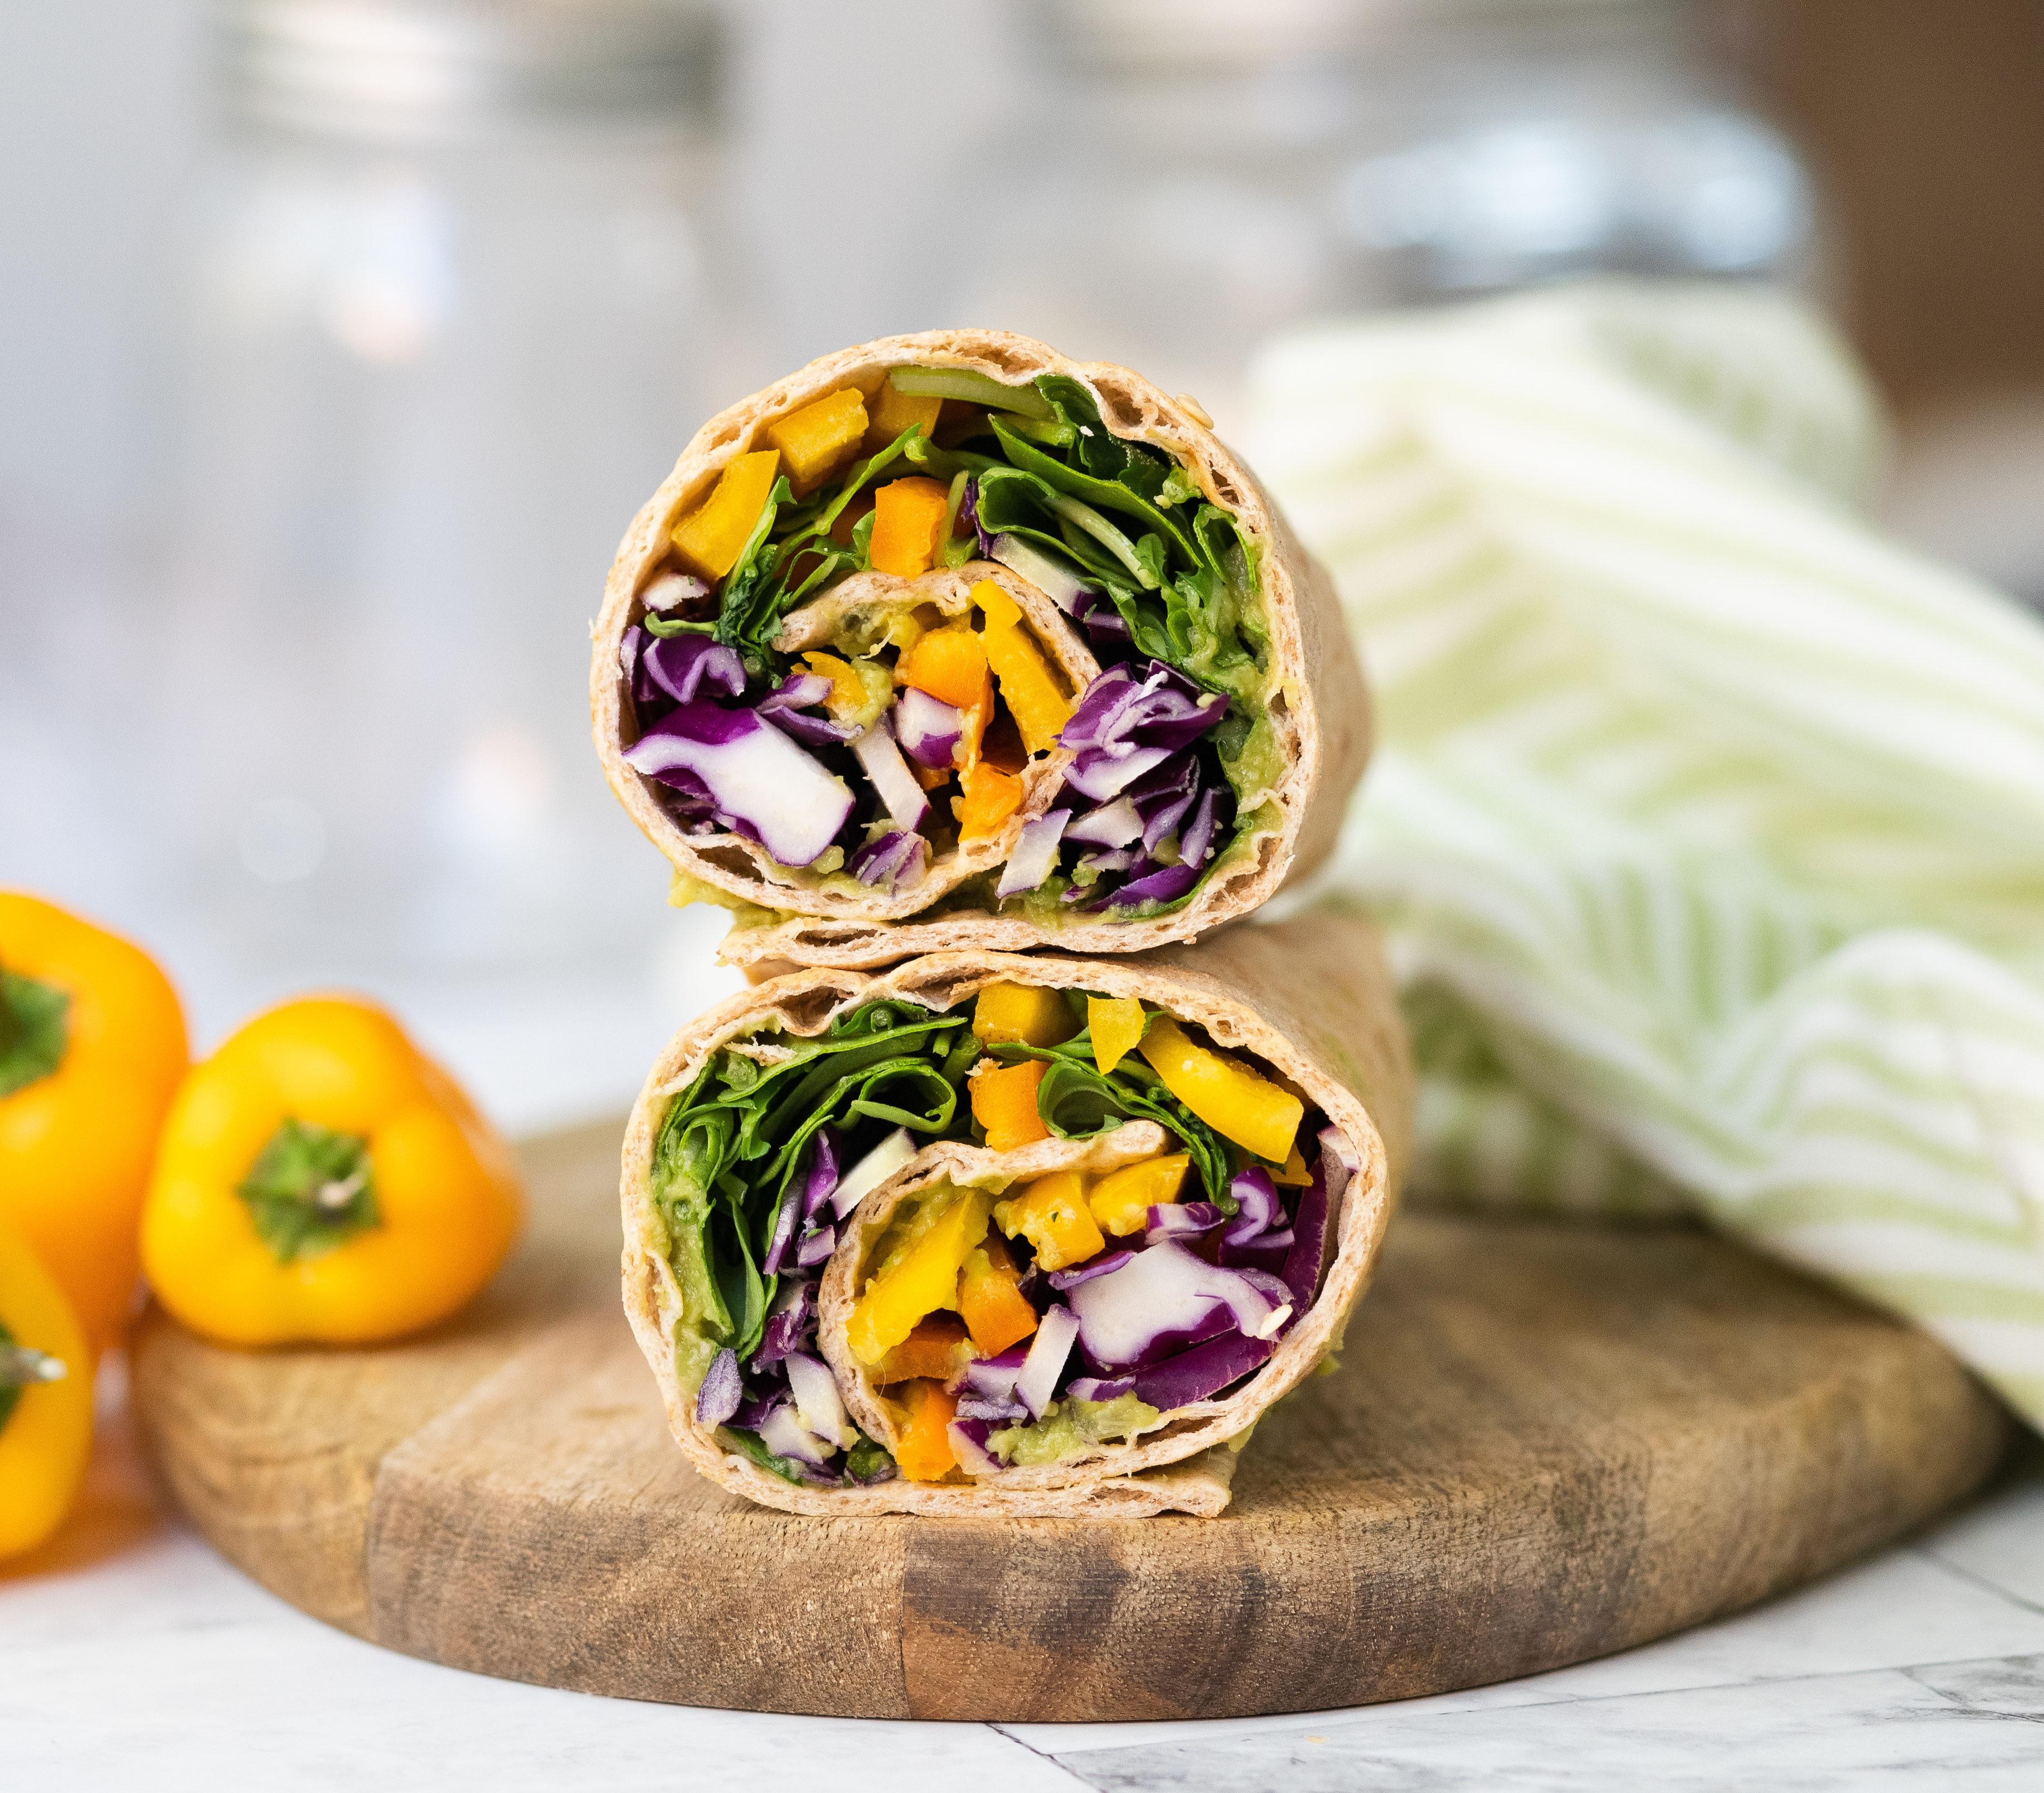 Avocado Veggie Lavash Wrap